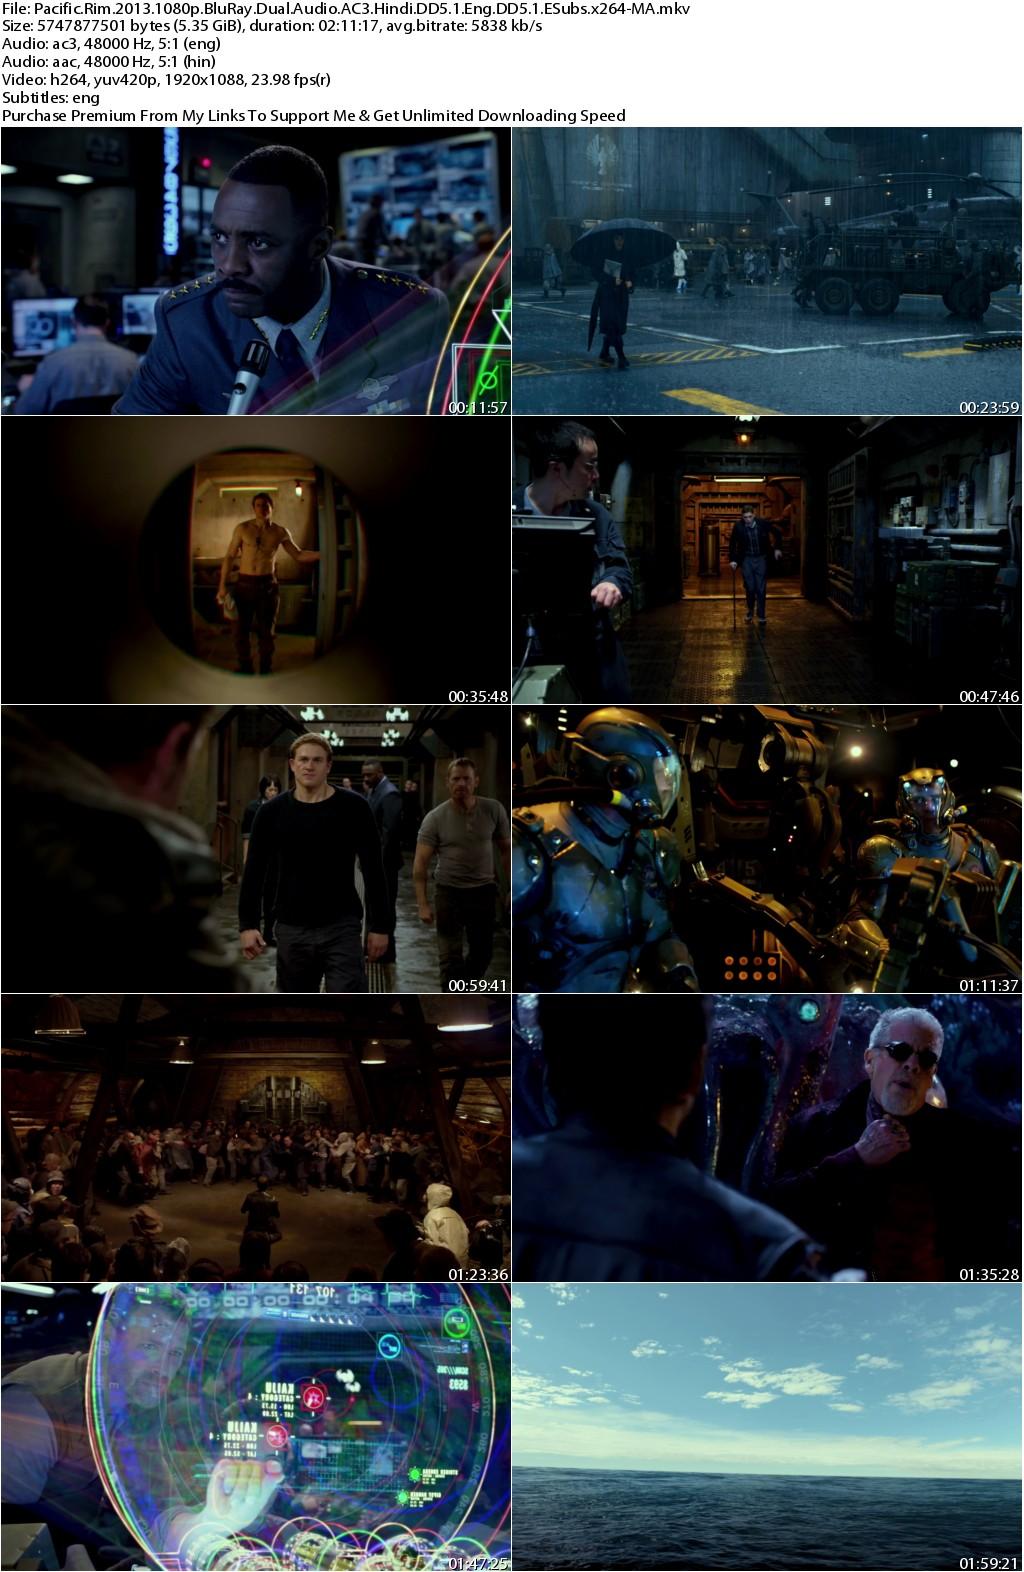 Pacific Rim (2013) 1080p BluRay Dual Audio AC3 Hindi DD5.1 Eng DD5.1 ESubs x264-MA